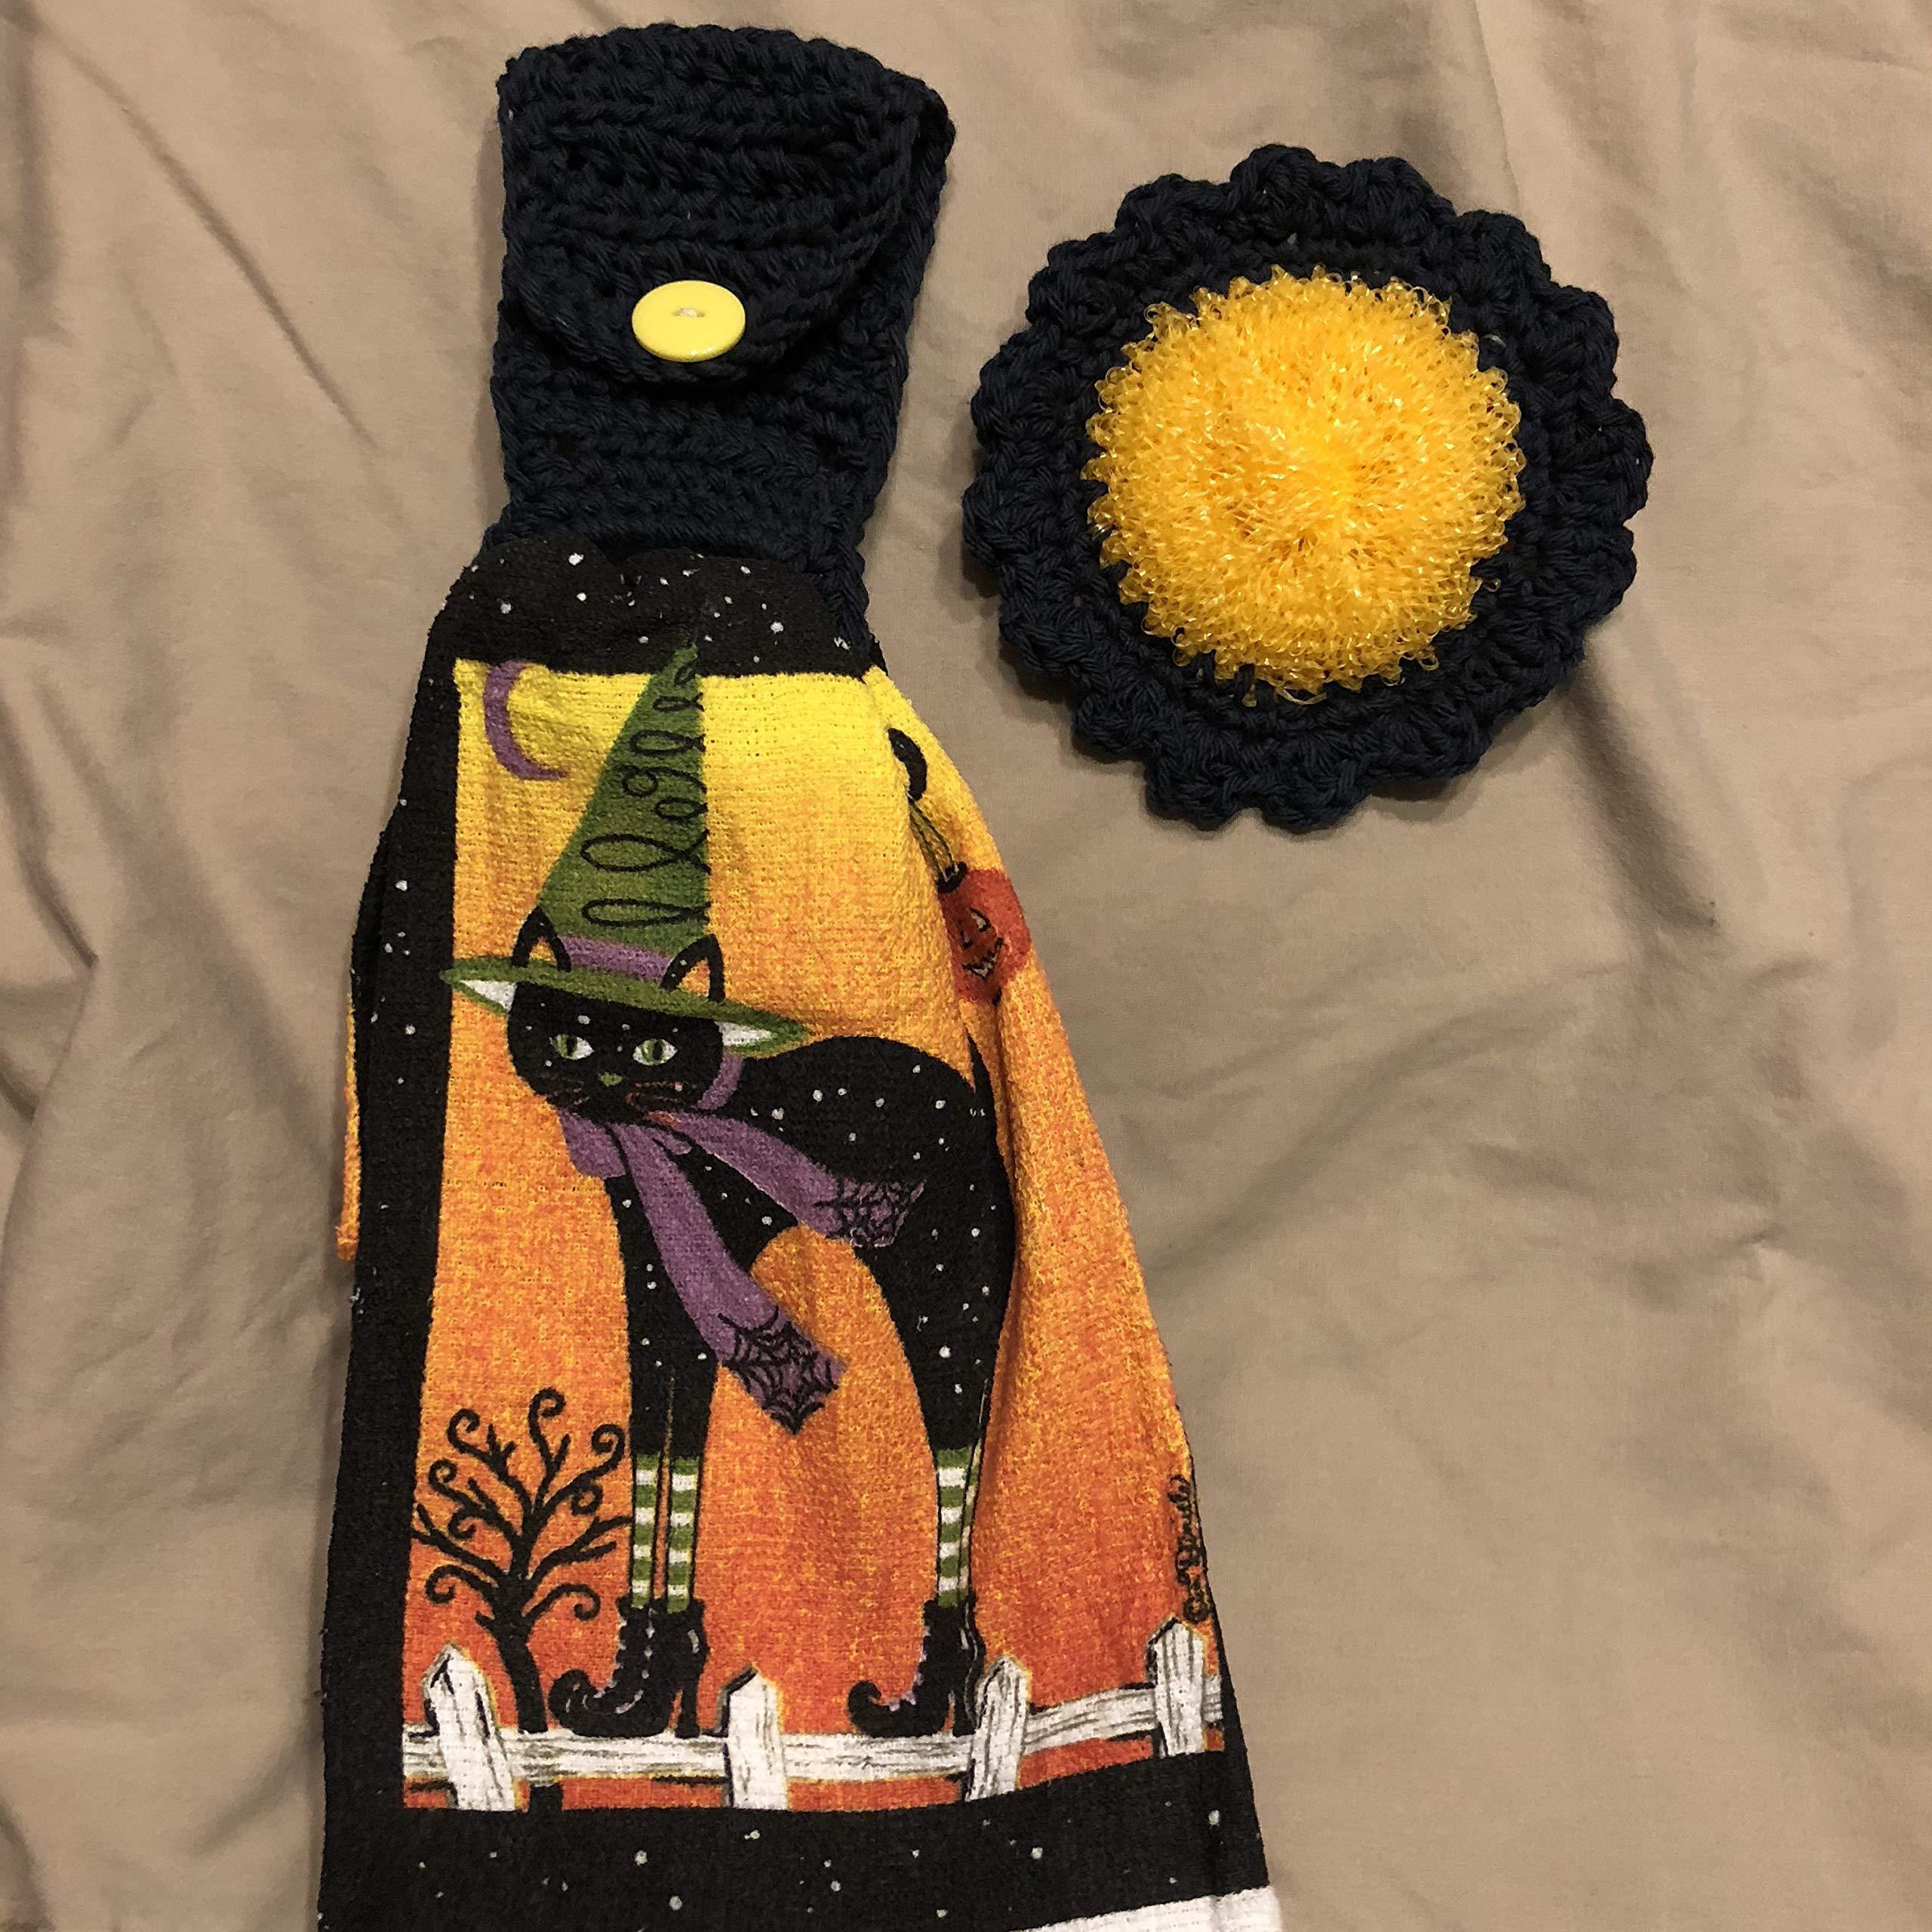 Free ship to USA - 3 piece set - Halloween Black Cat High Heels - 1 CROCHET Plastic Scrubber, Towel holder & KITCHEN hand TOWEL light weight terry cloth - Black 100% cotton yarn